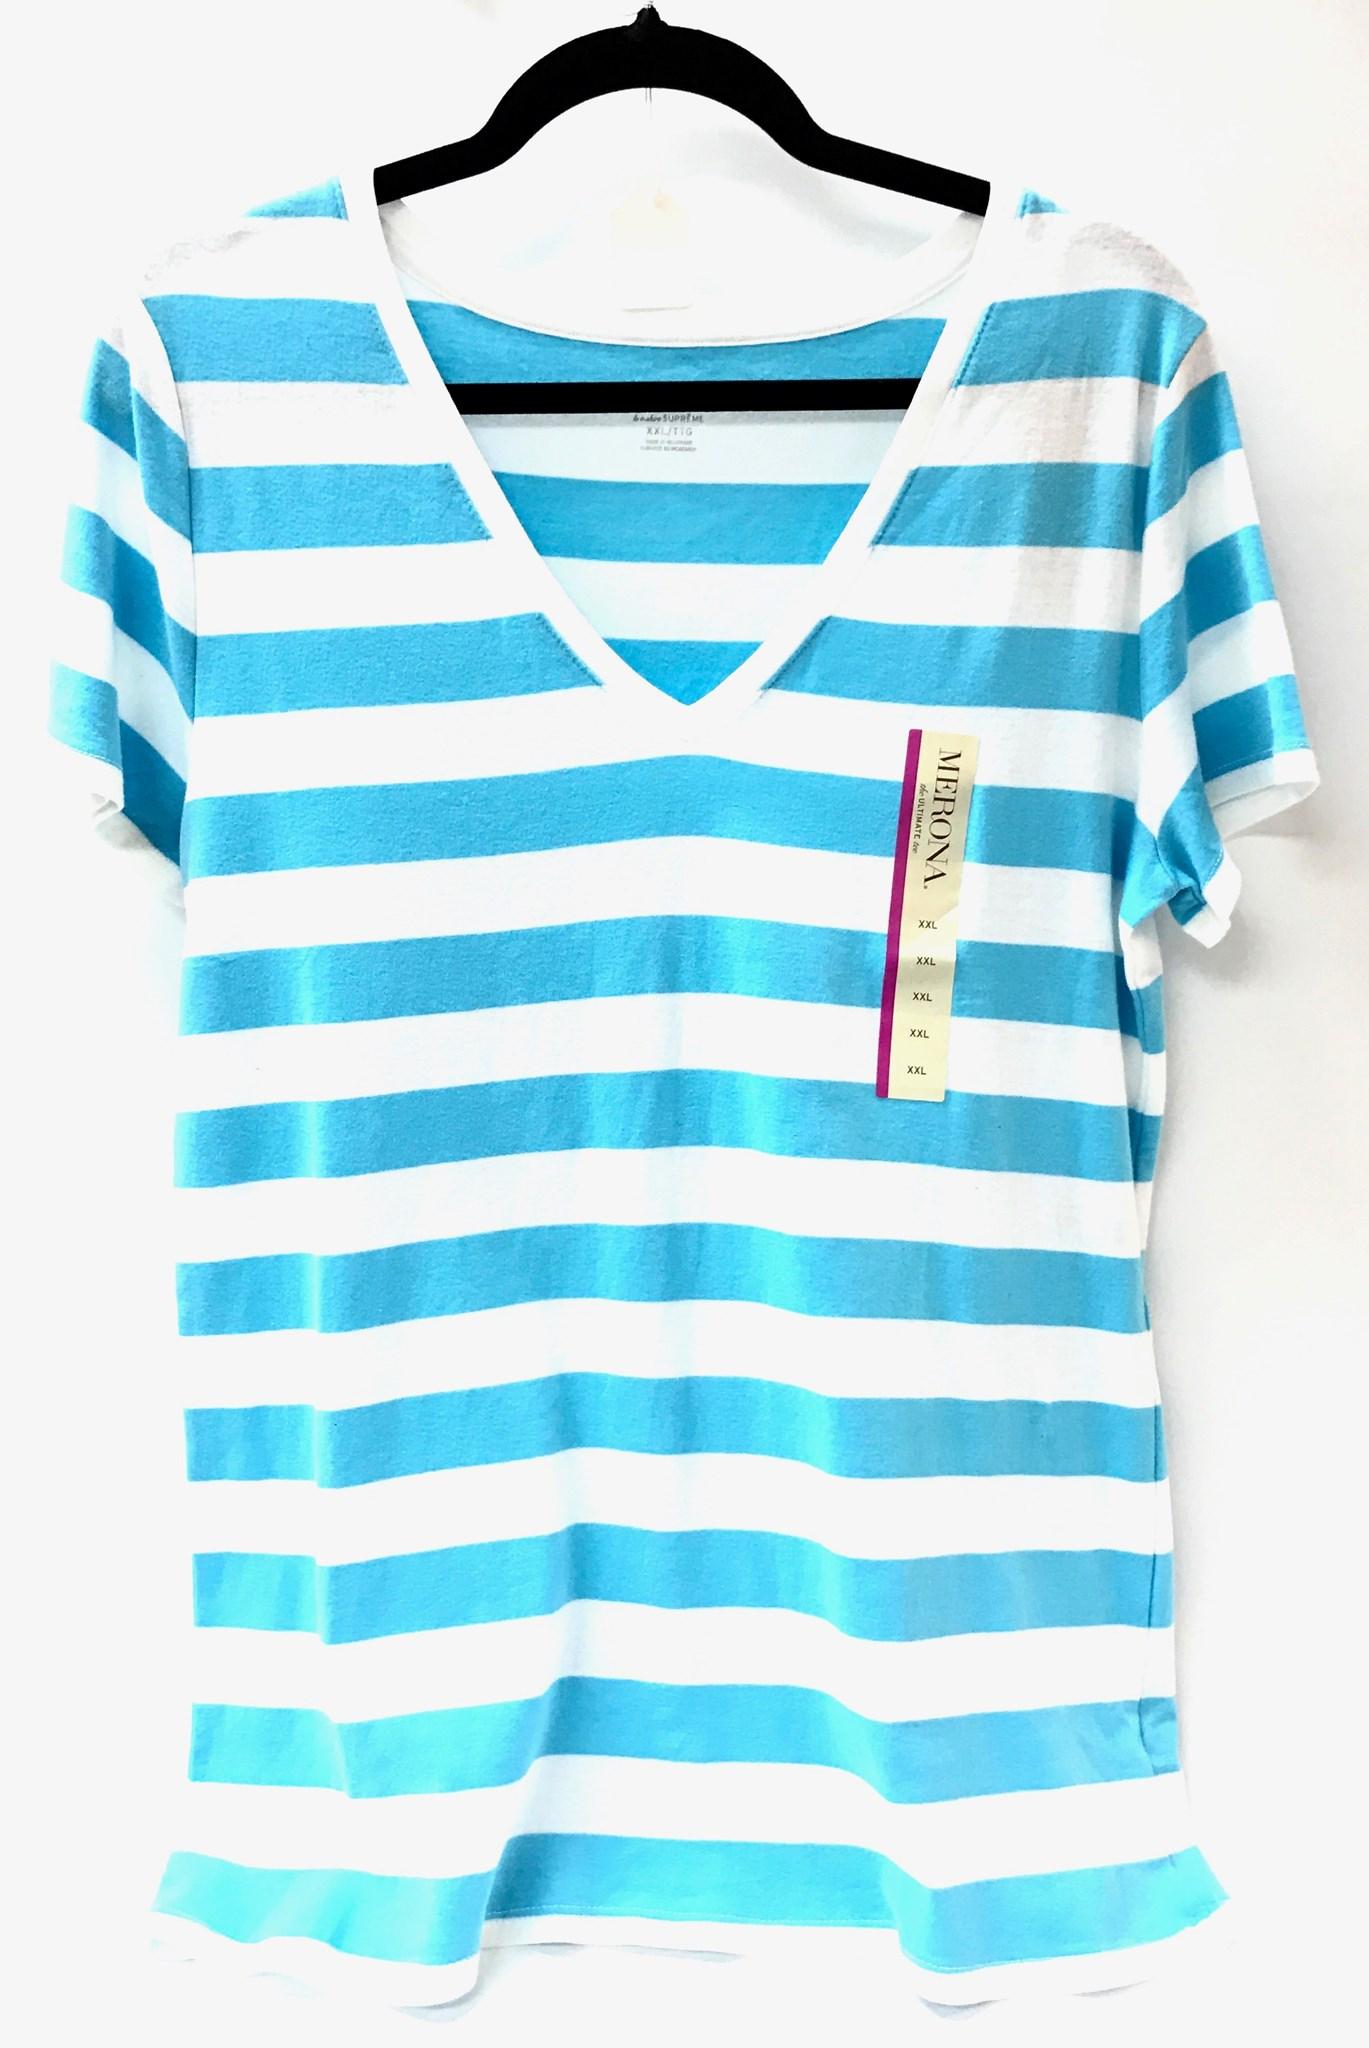 White Stripe Shirt Size X-Large